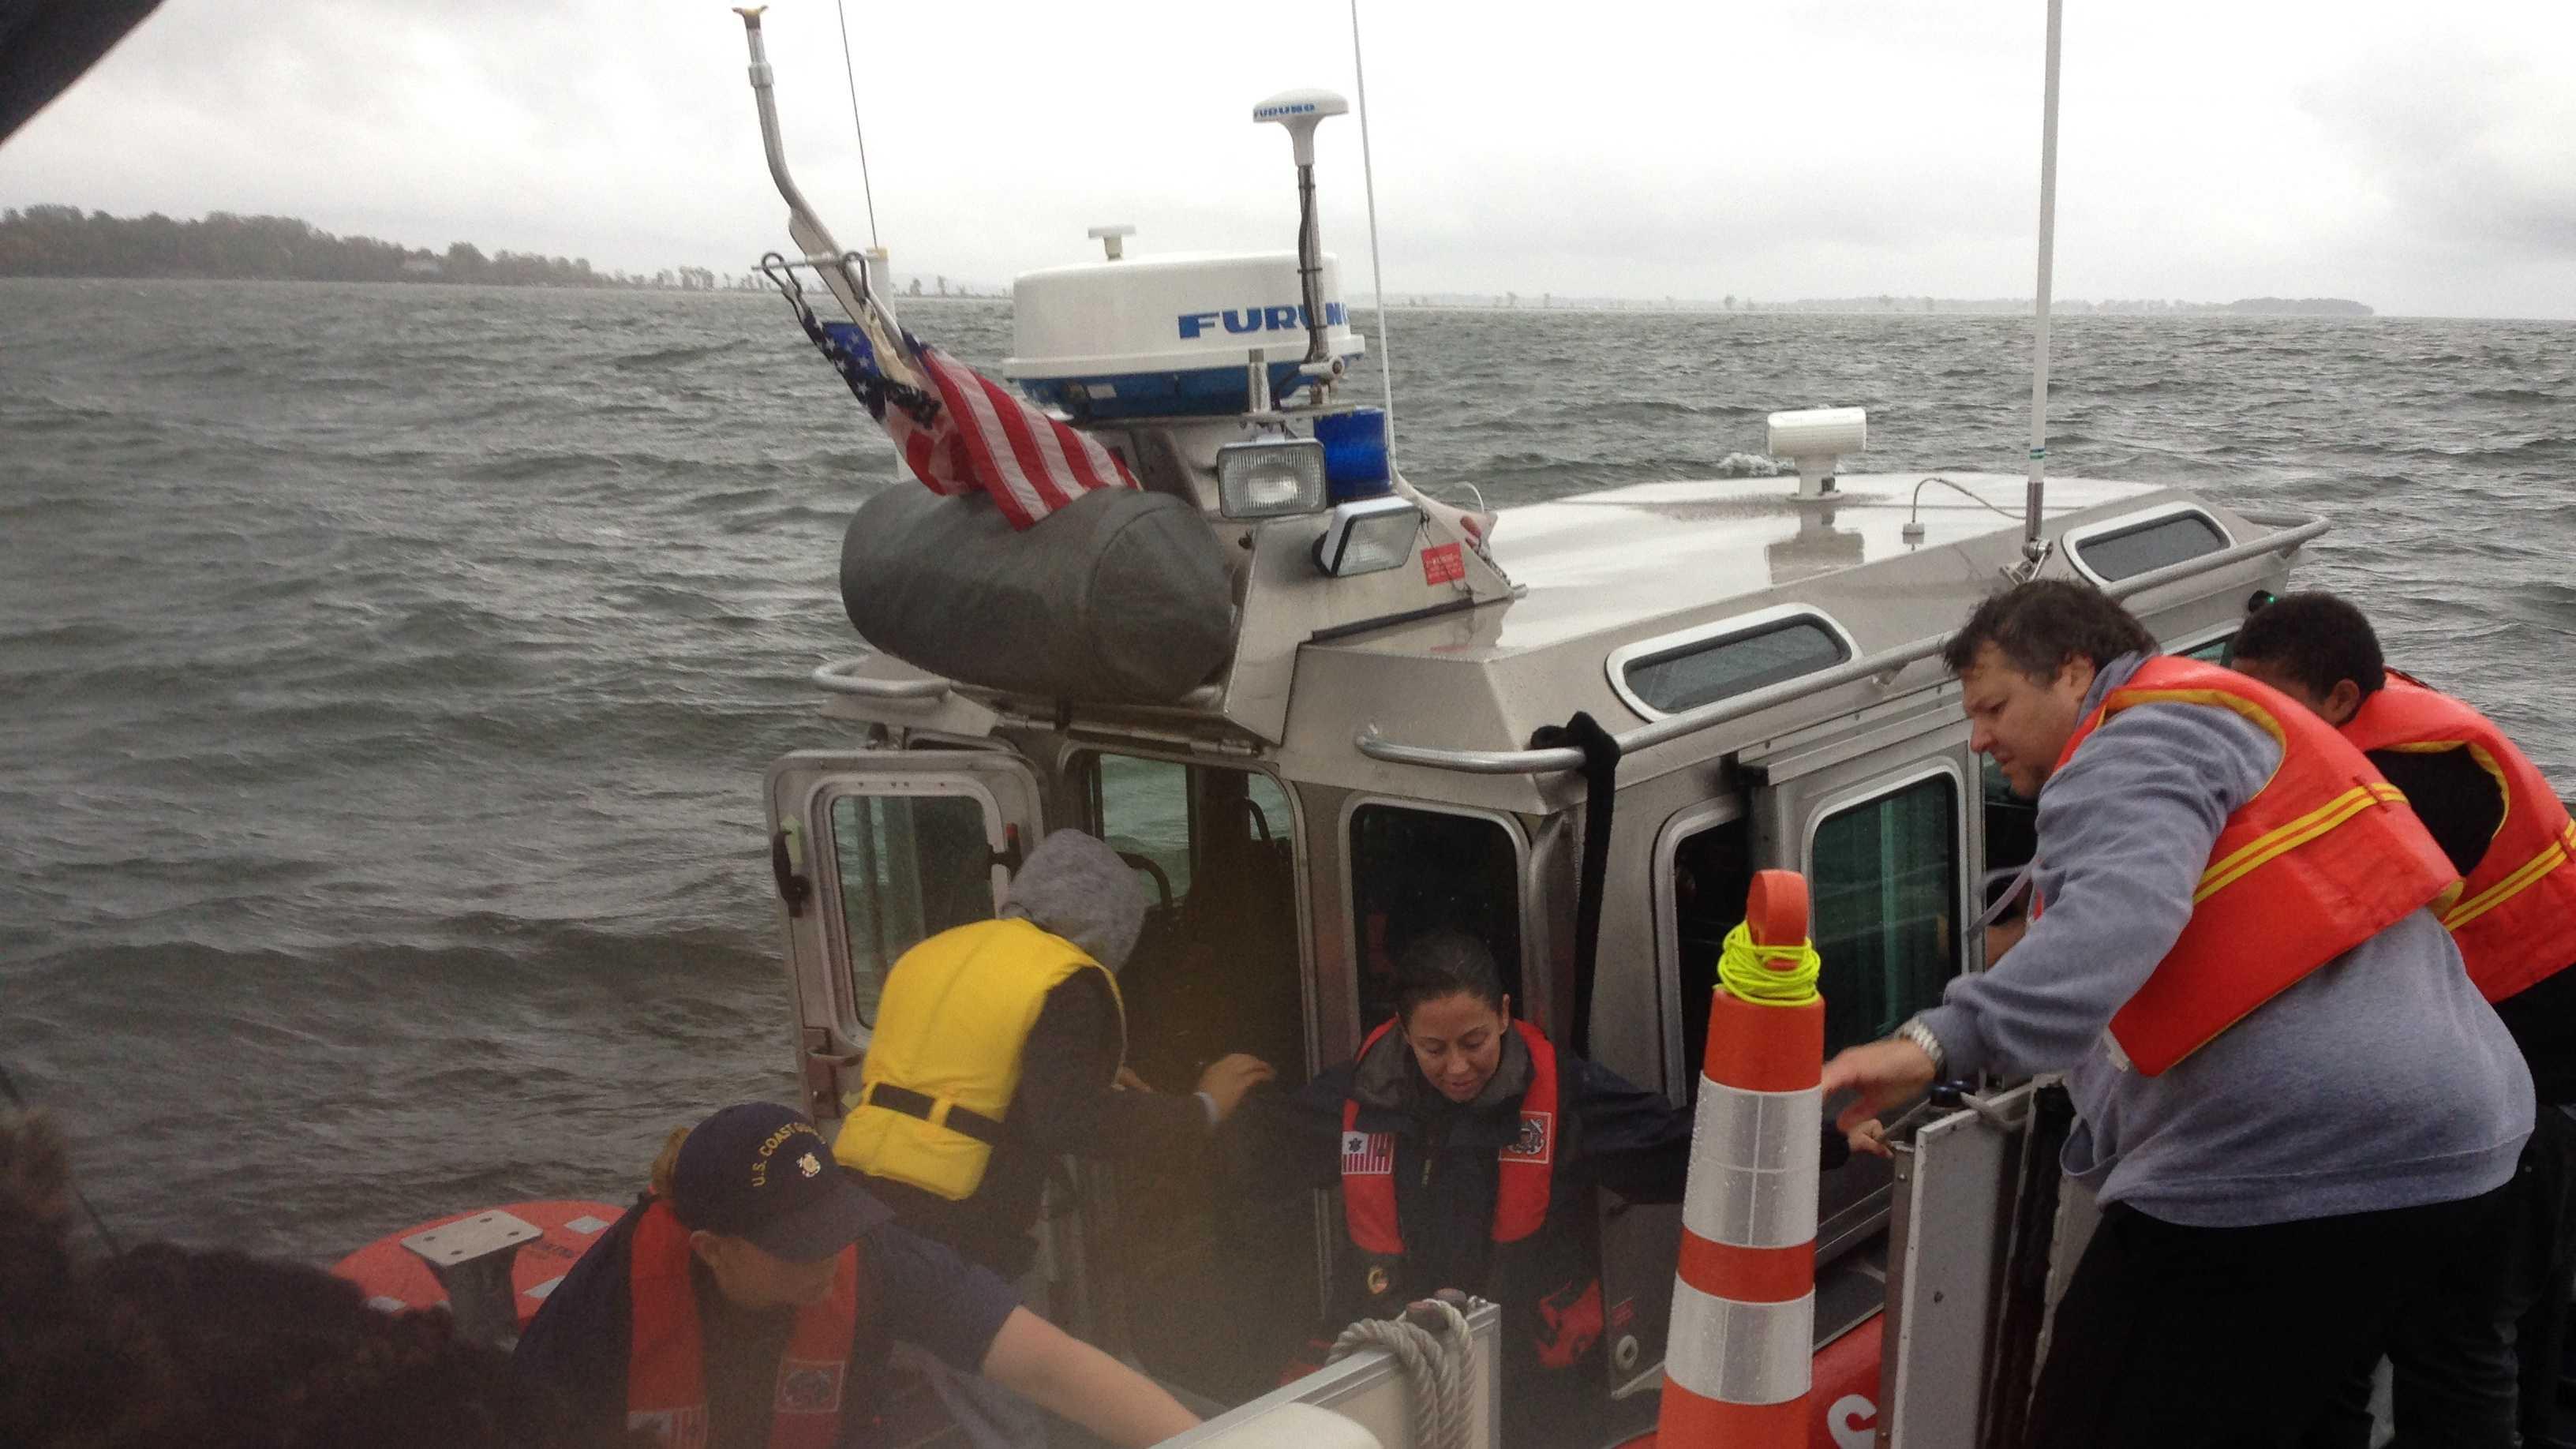 10-6-13 Family rescued on Lake Champlain - img